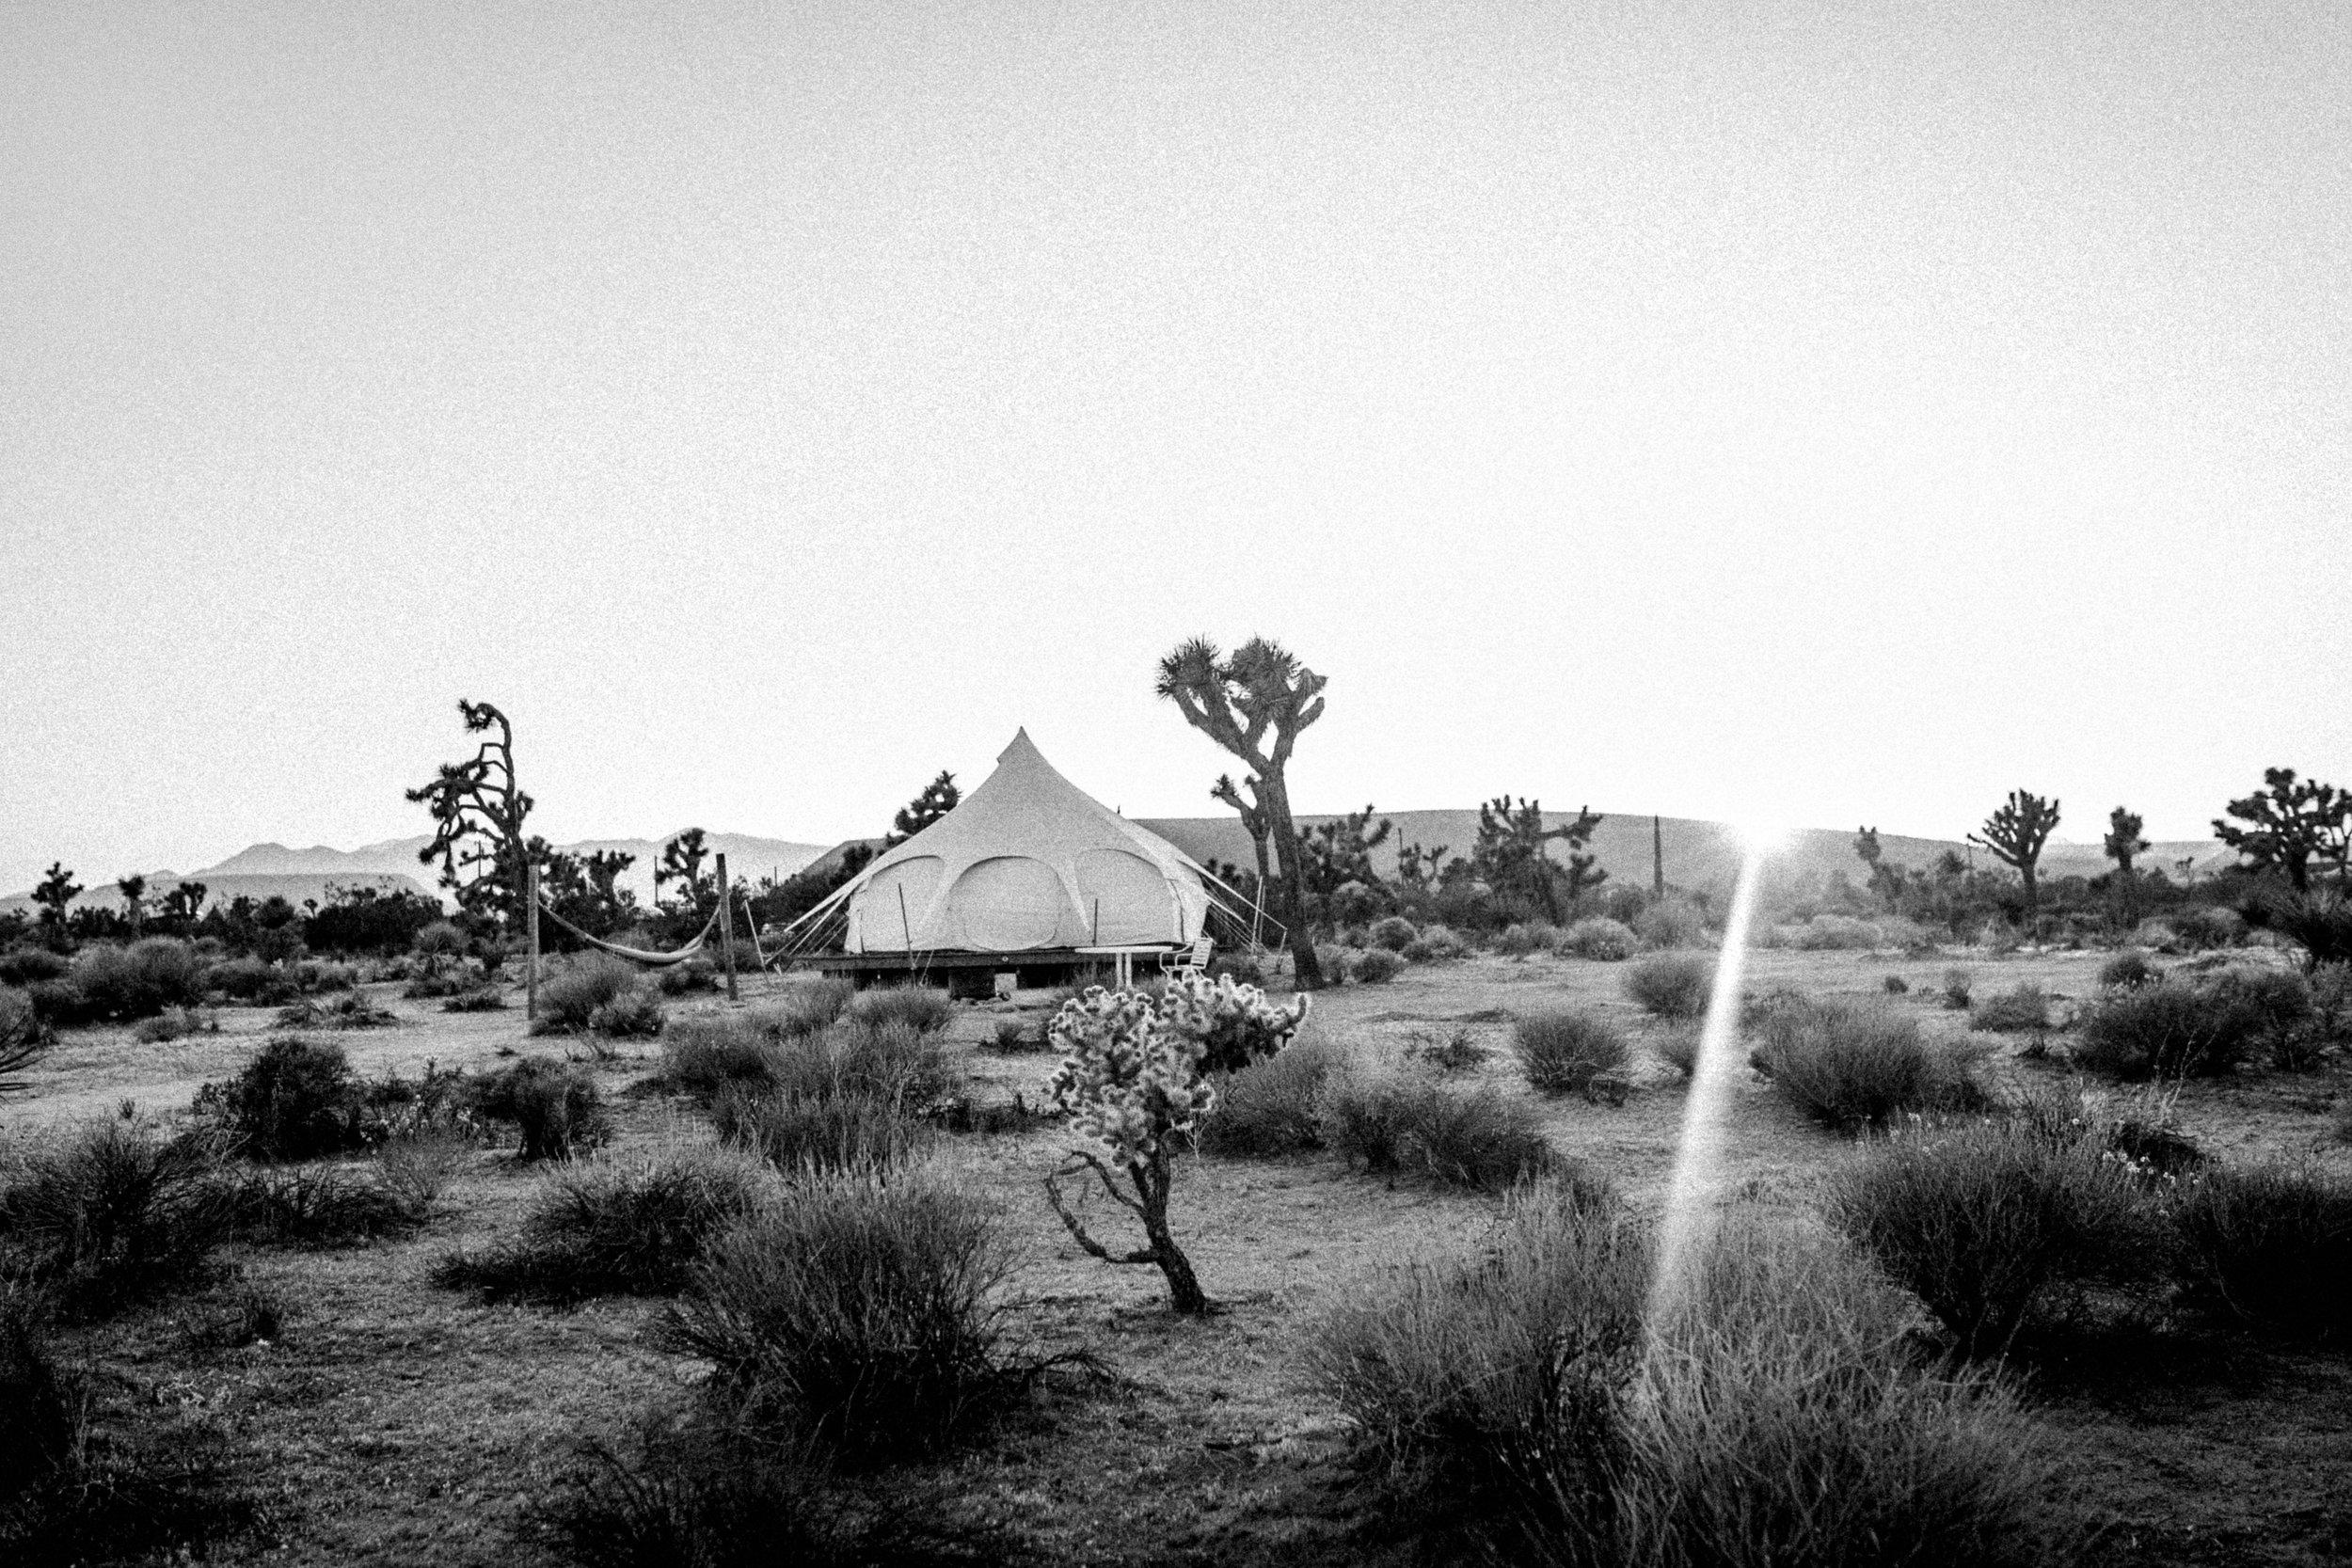 Camping - Yucca Valley, California